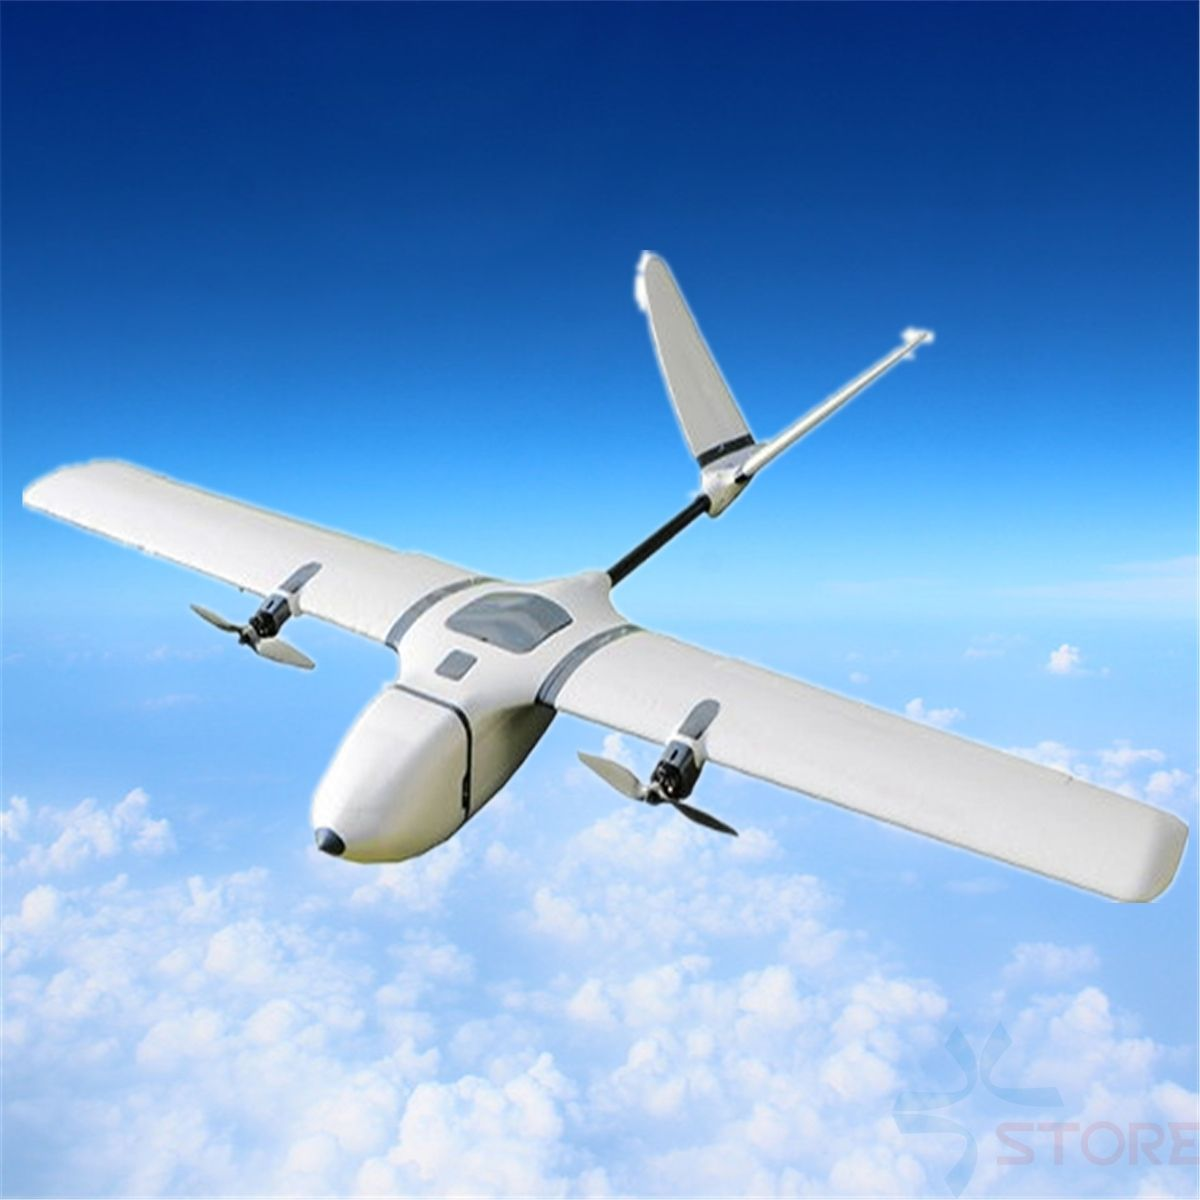 MyFlyDream MFD Nimbus 1800mm Wingspan FPV Aircraft Long Range RC Airplane KIT